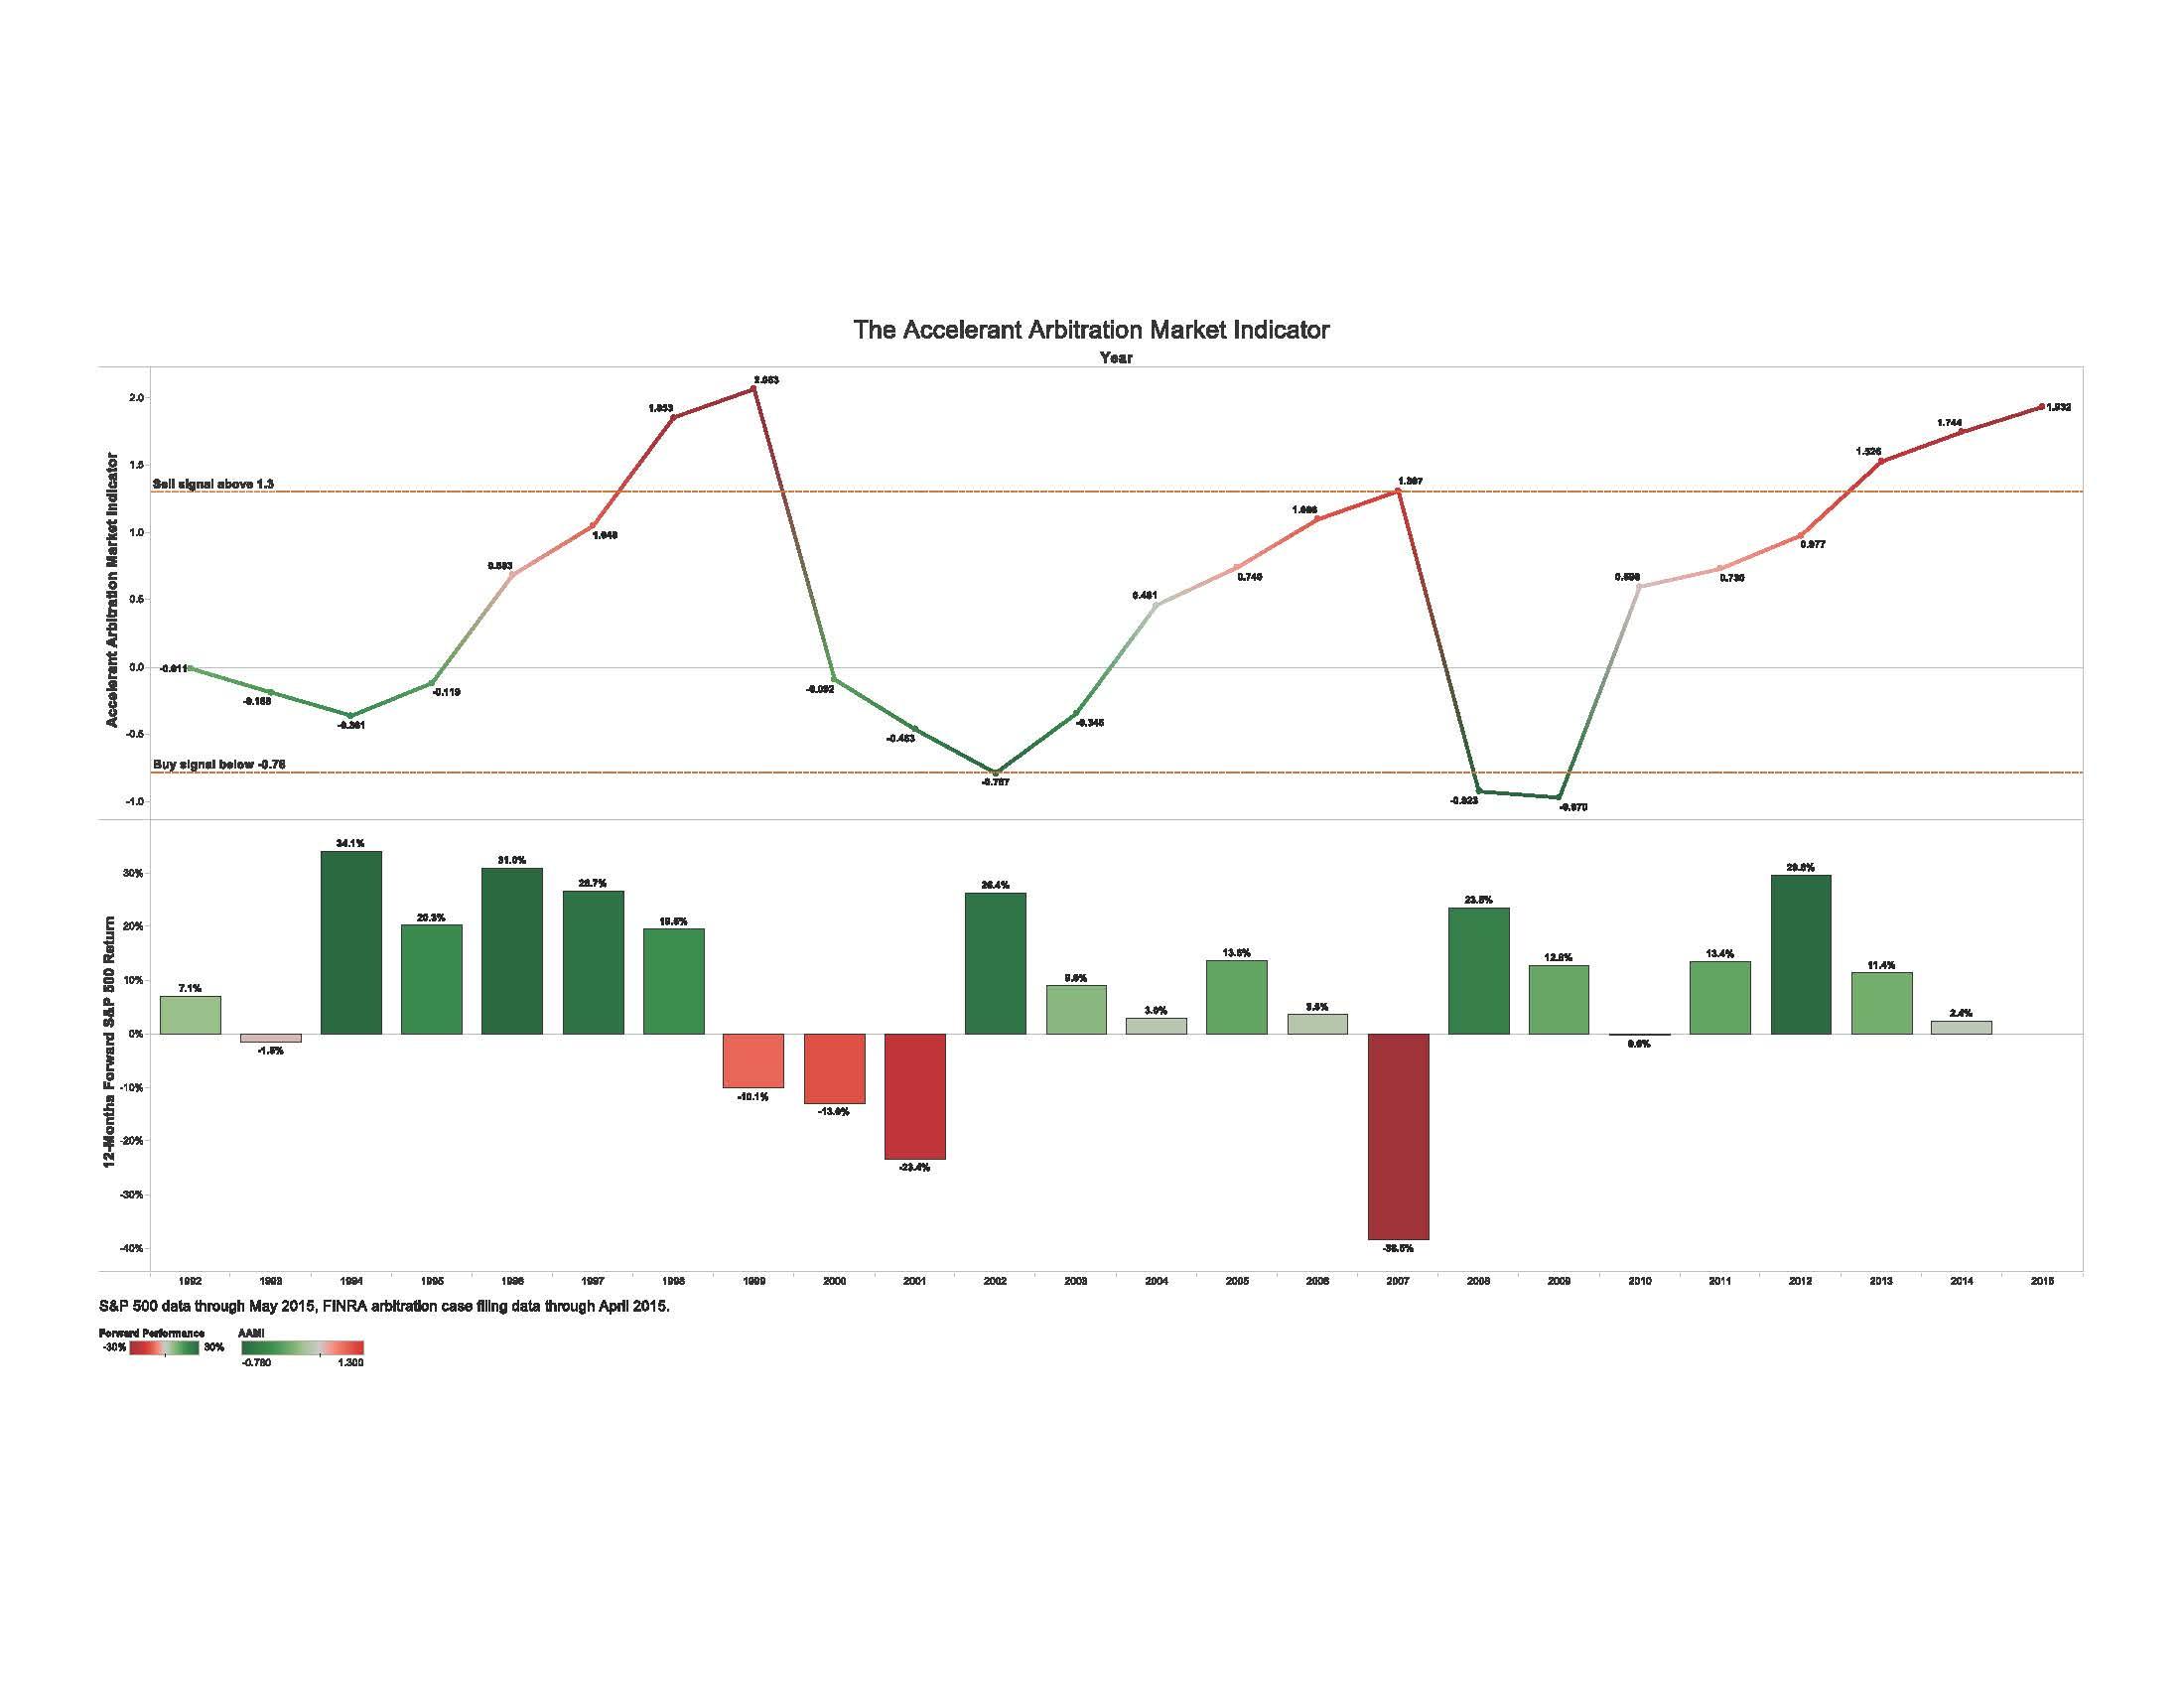 6.16.15_Accelerant_Arbitration_Market_Indicator